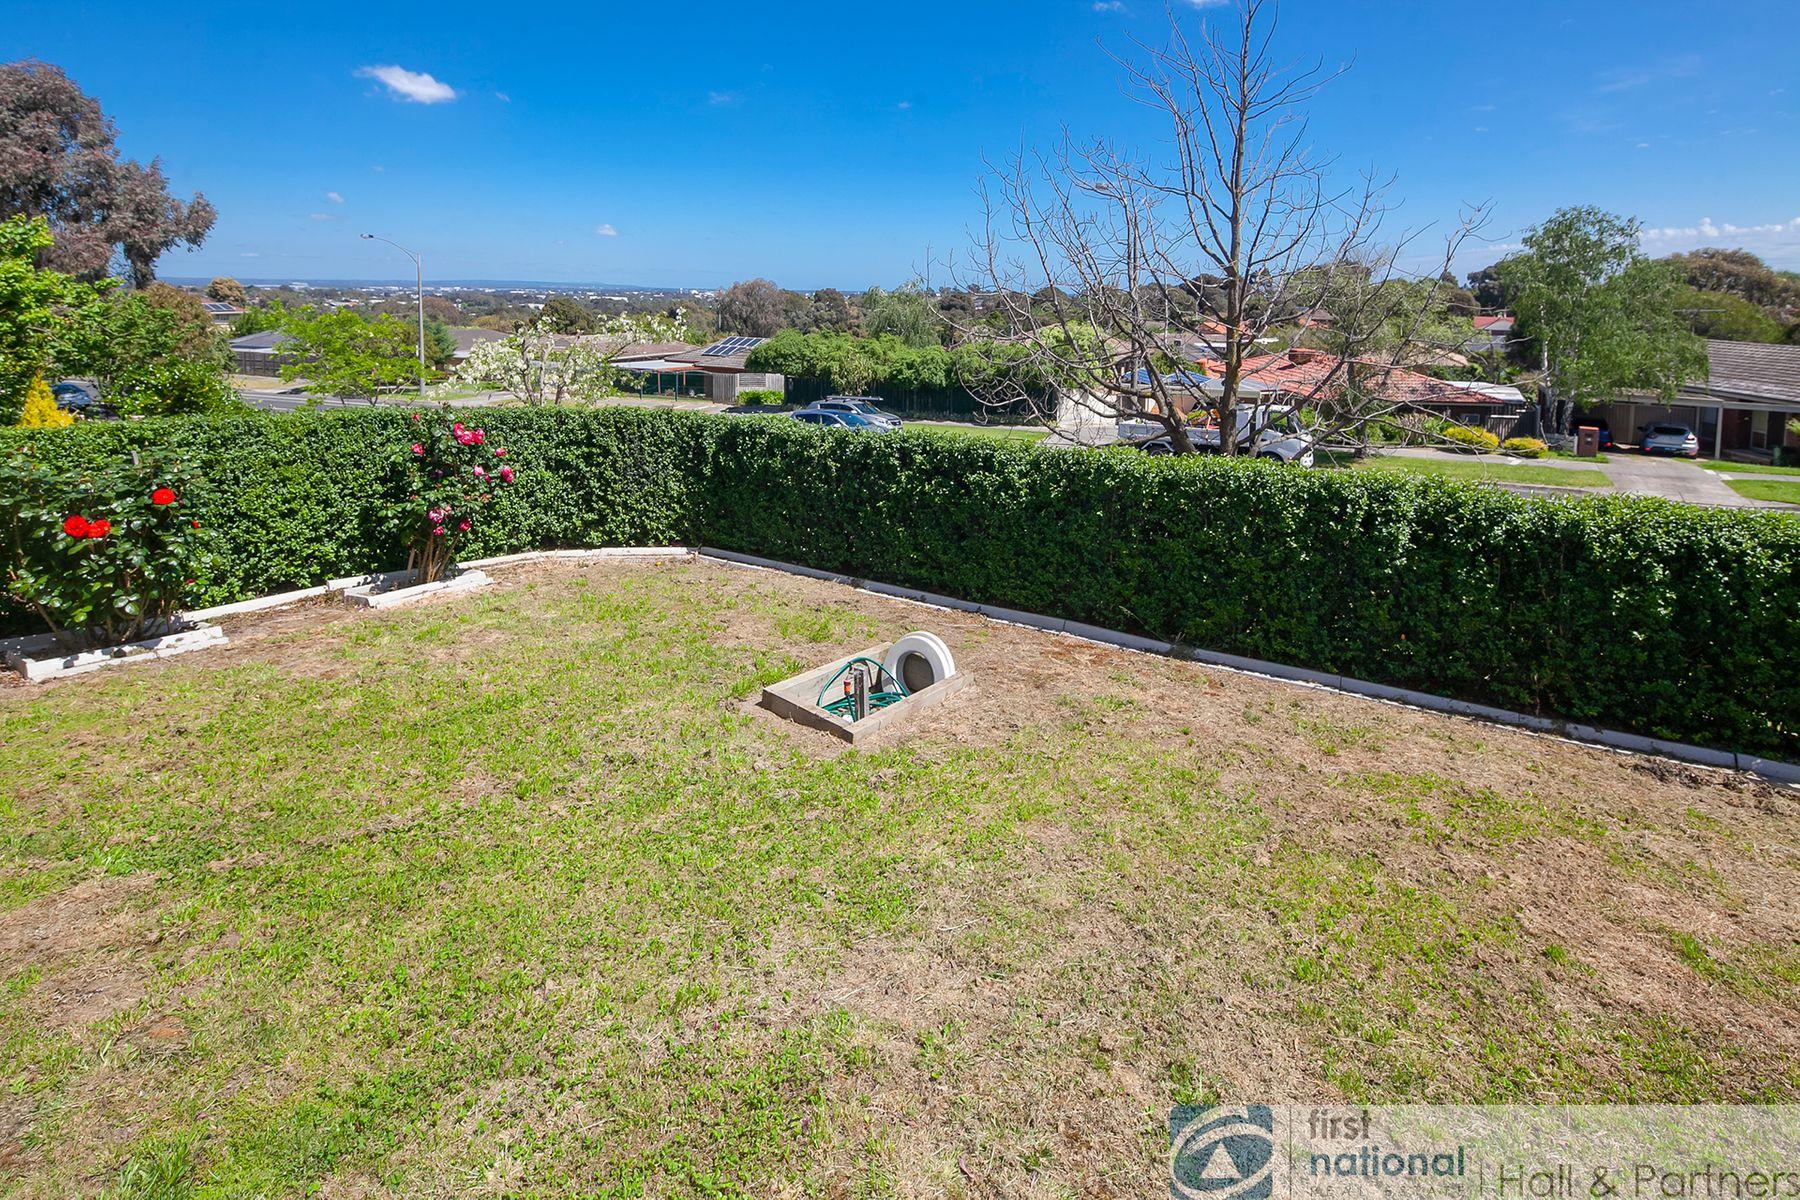 46 Matthew Flinders Avenue, Endeavour Hills, VIC 3802